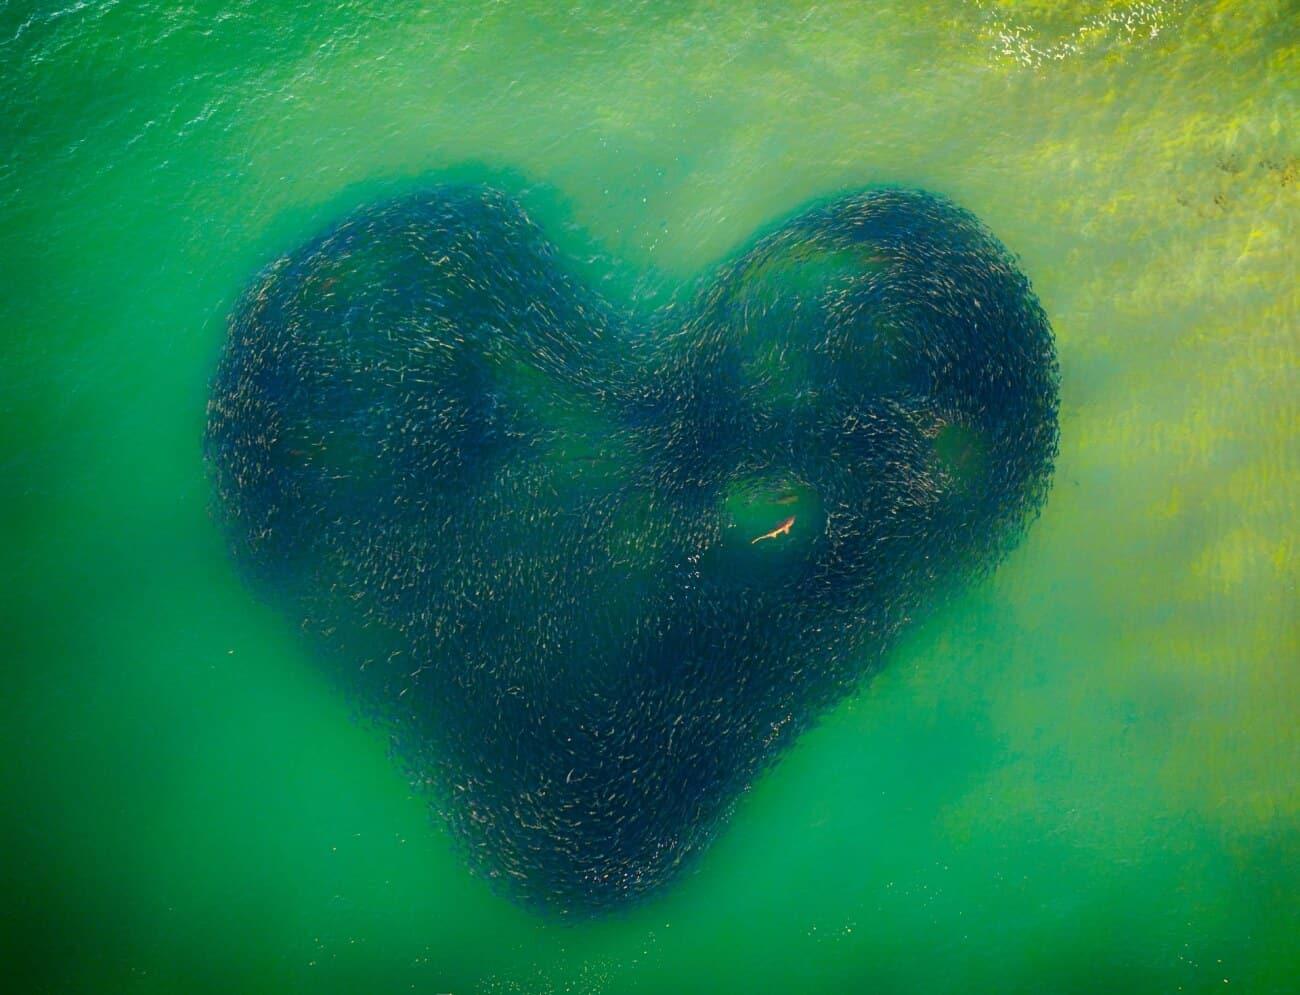 Love Heart of Nature mejor fotografia del año